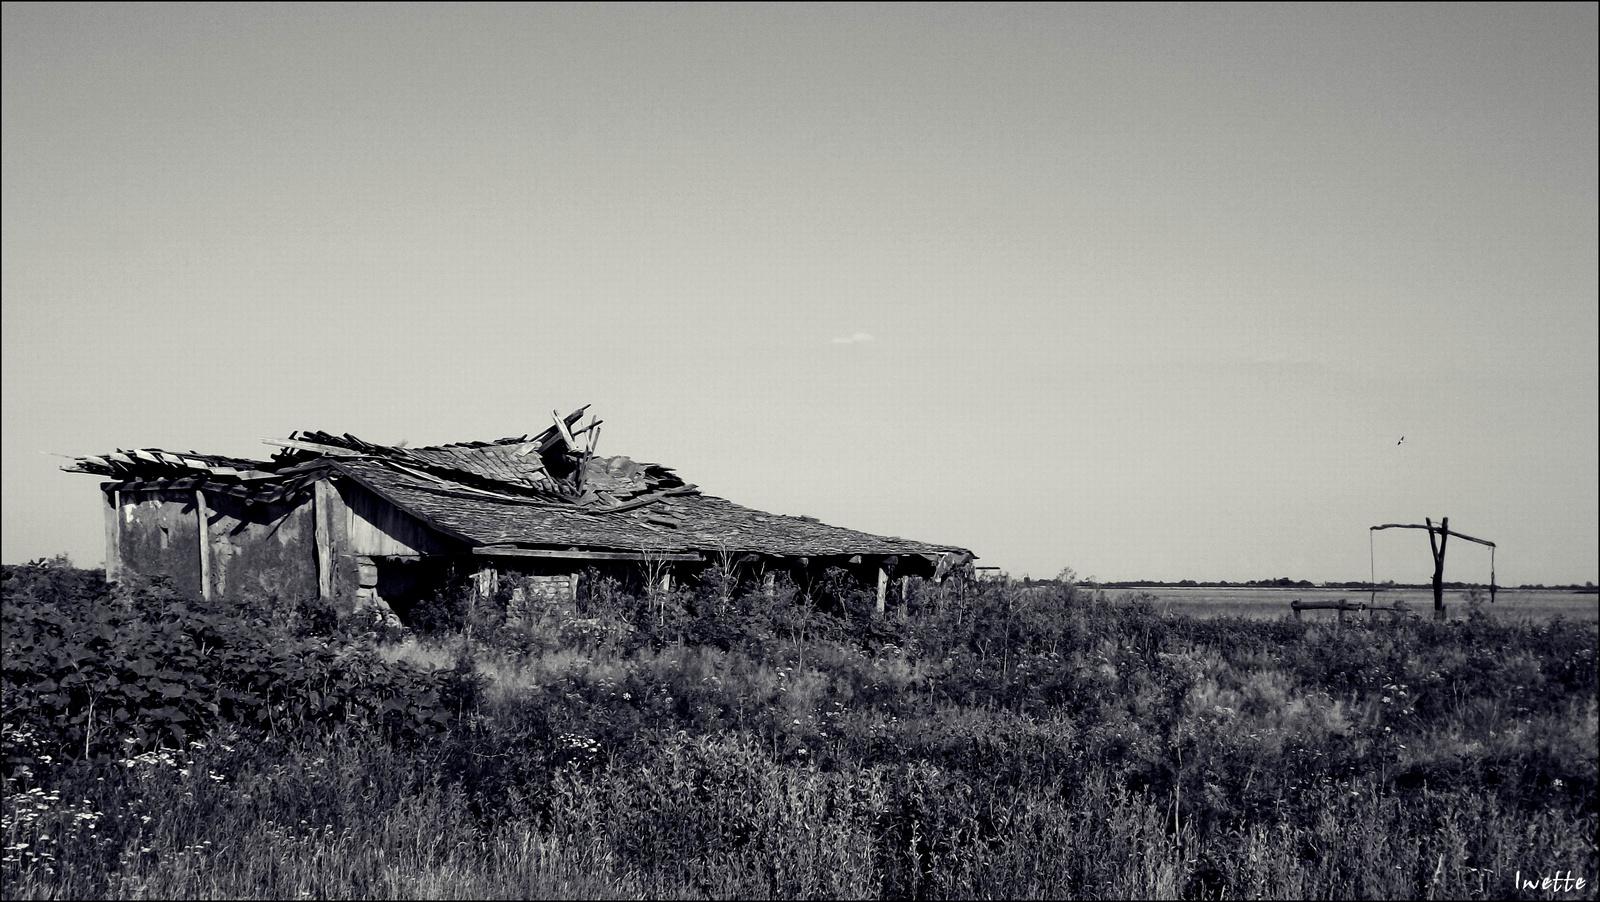 Kihalt tanyavilág